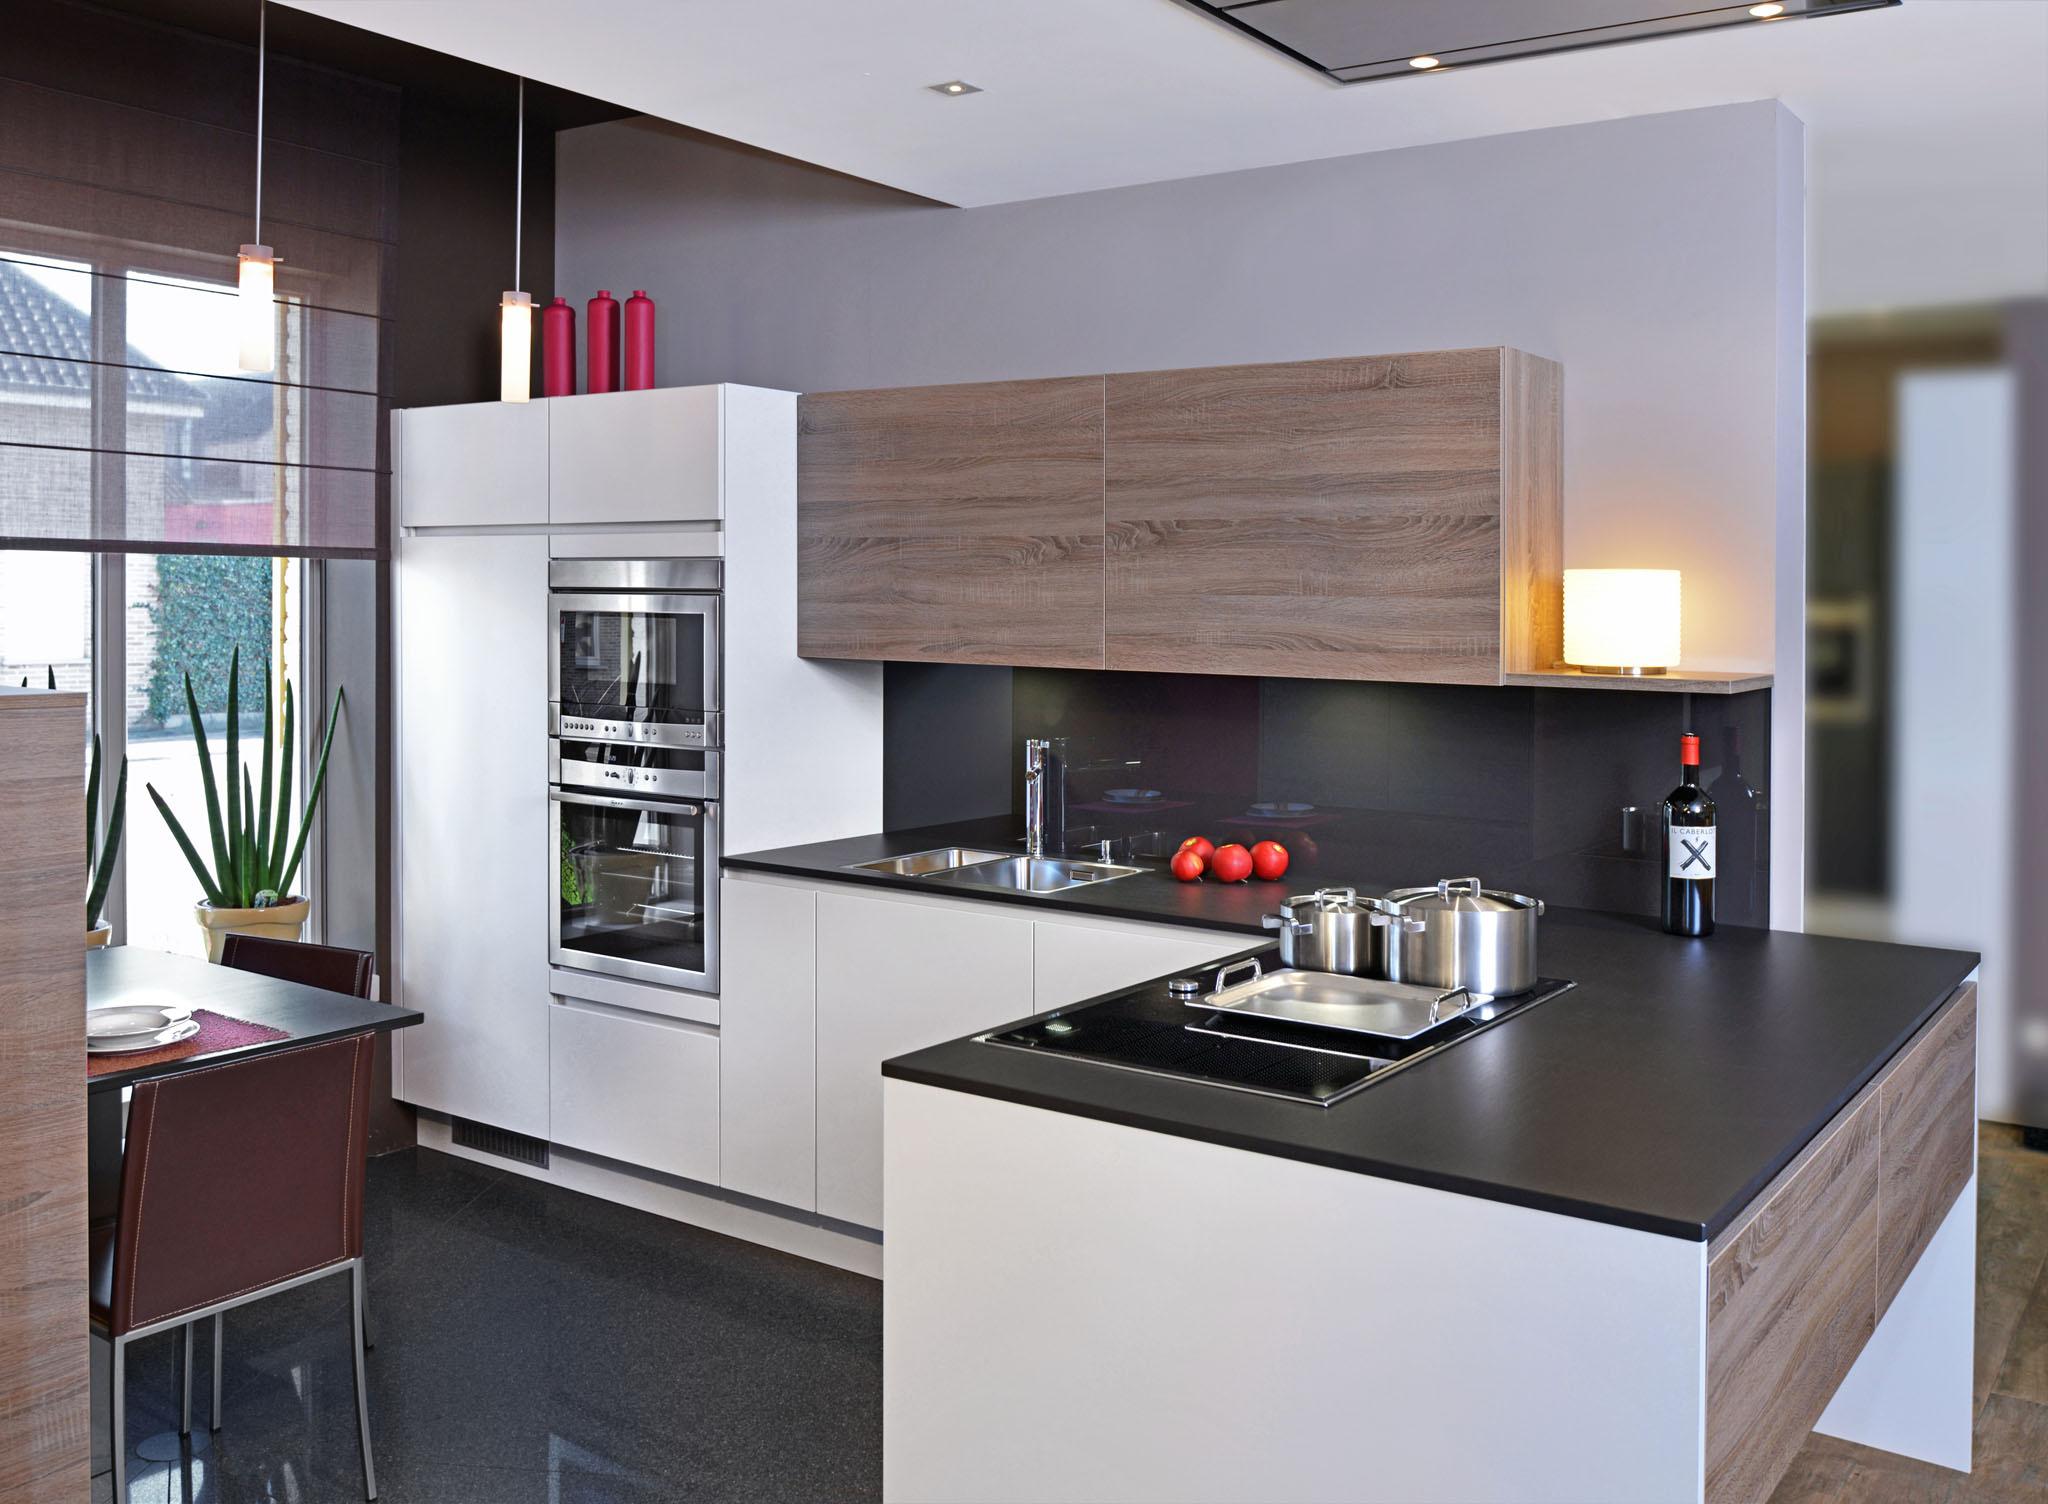 Moderne of eigentijdse keuken